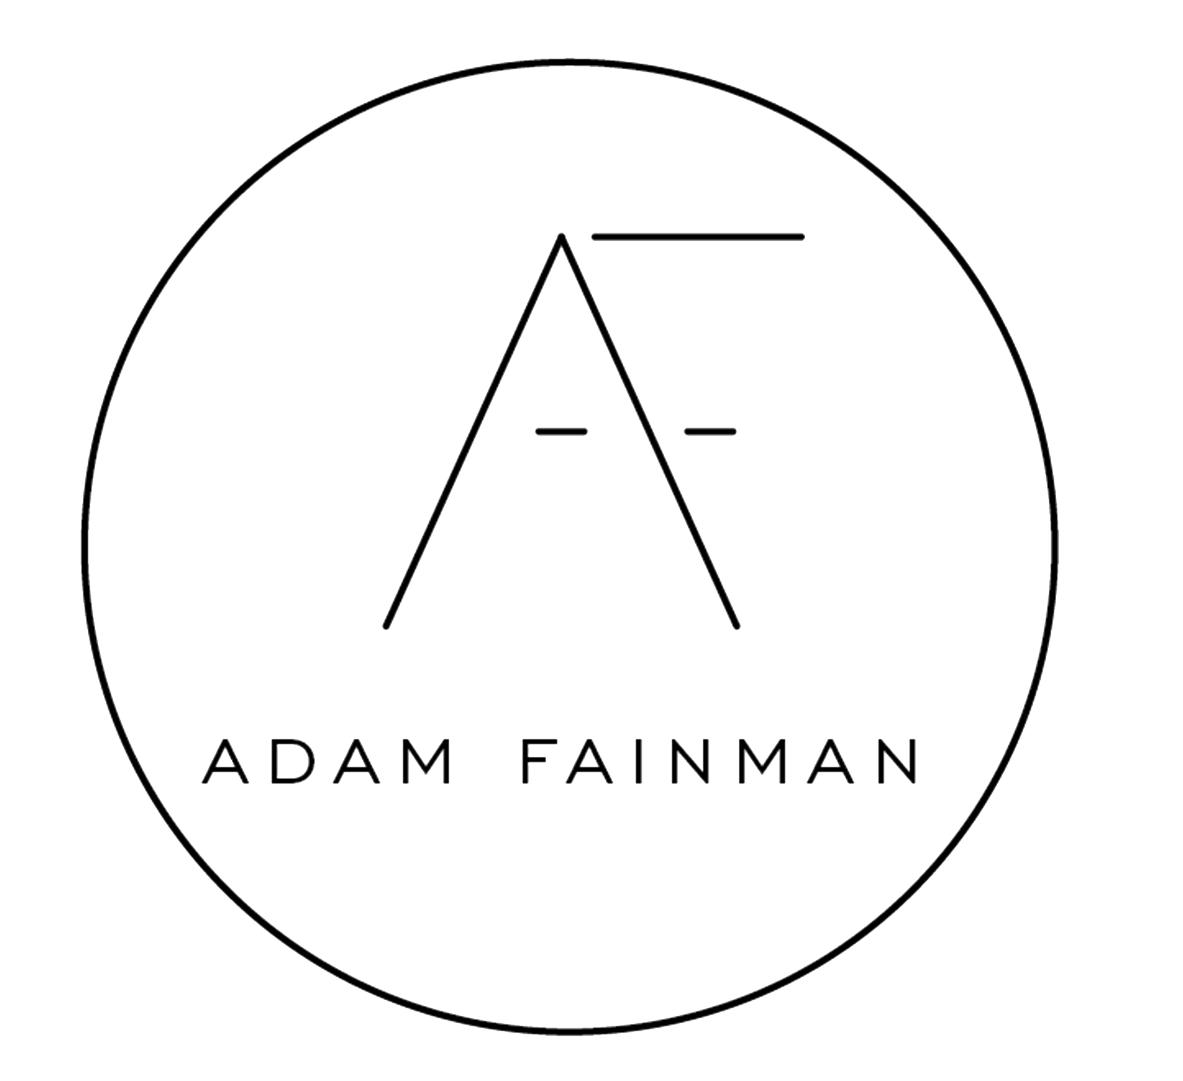 AdamFainmanLogoBlack (3)